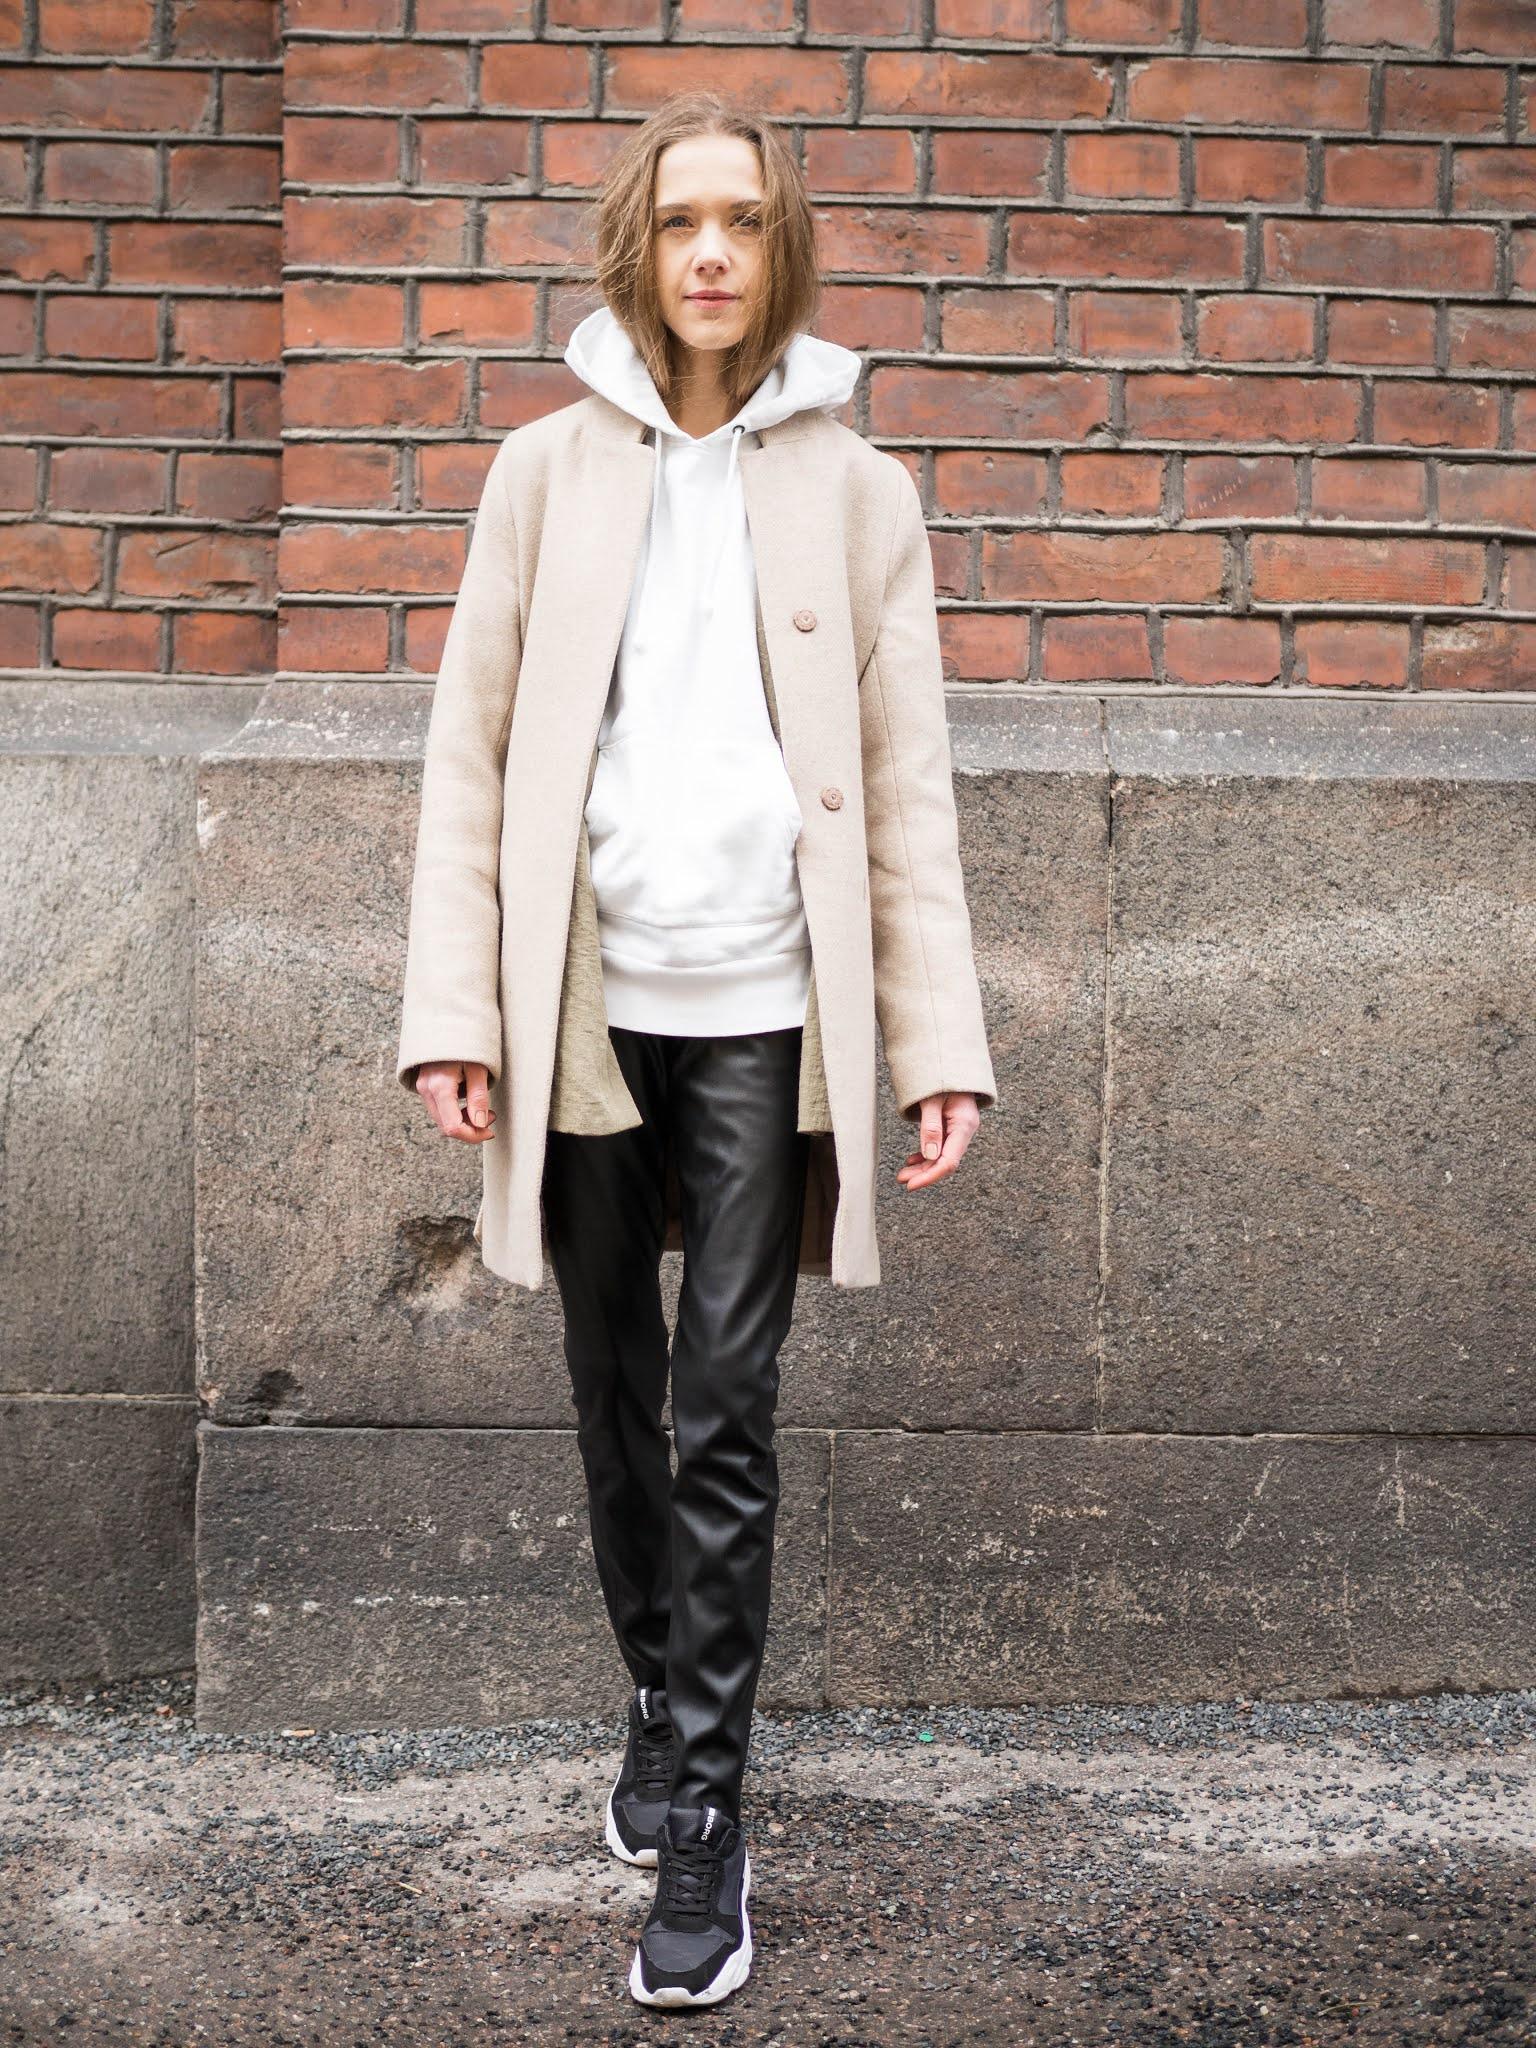 Kuinka pukea bleiseri hupparin kanssa // How to style hoodies with blazers